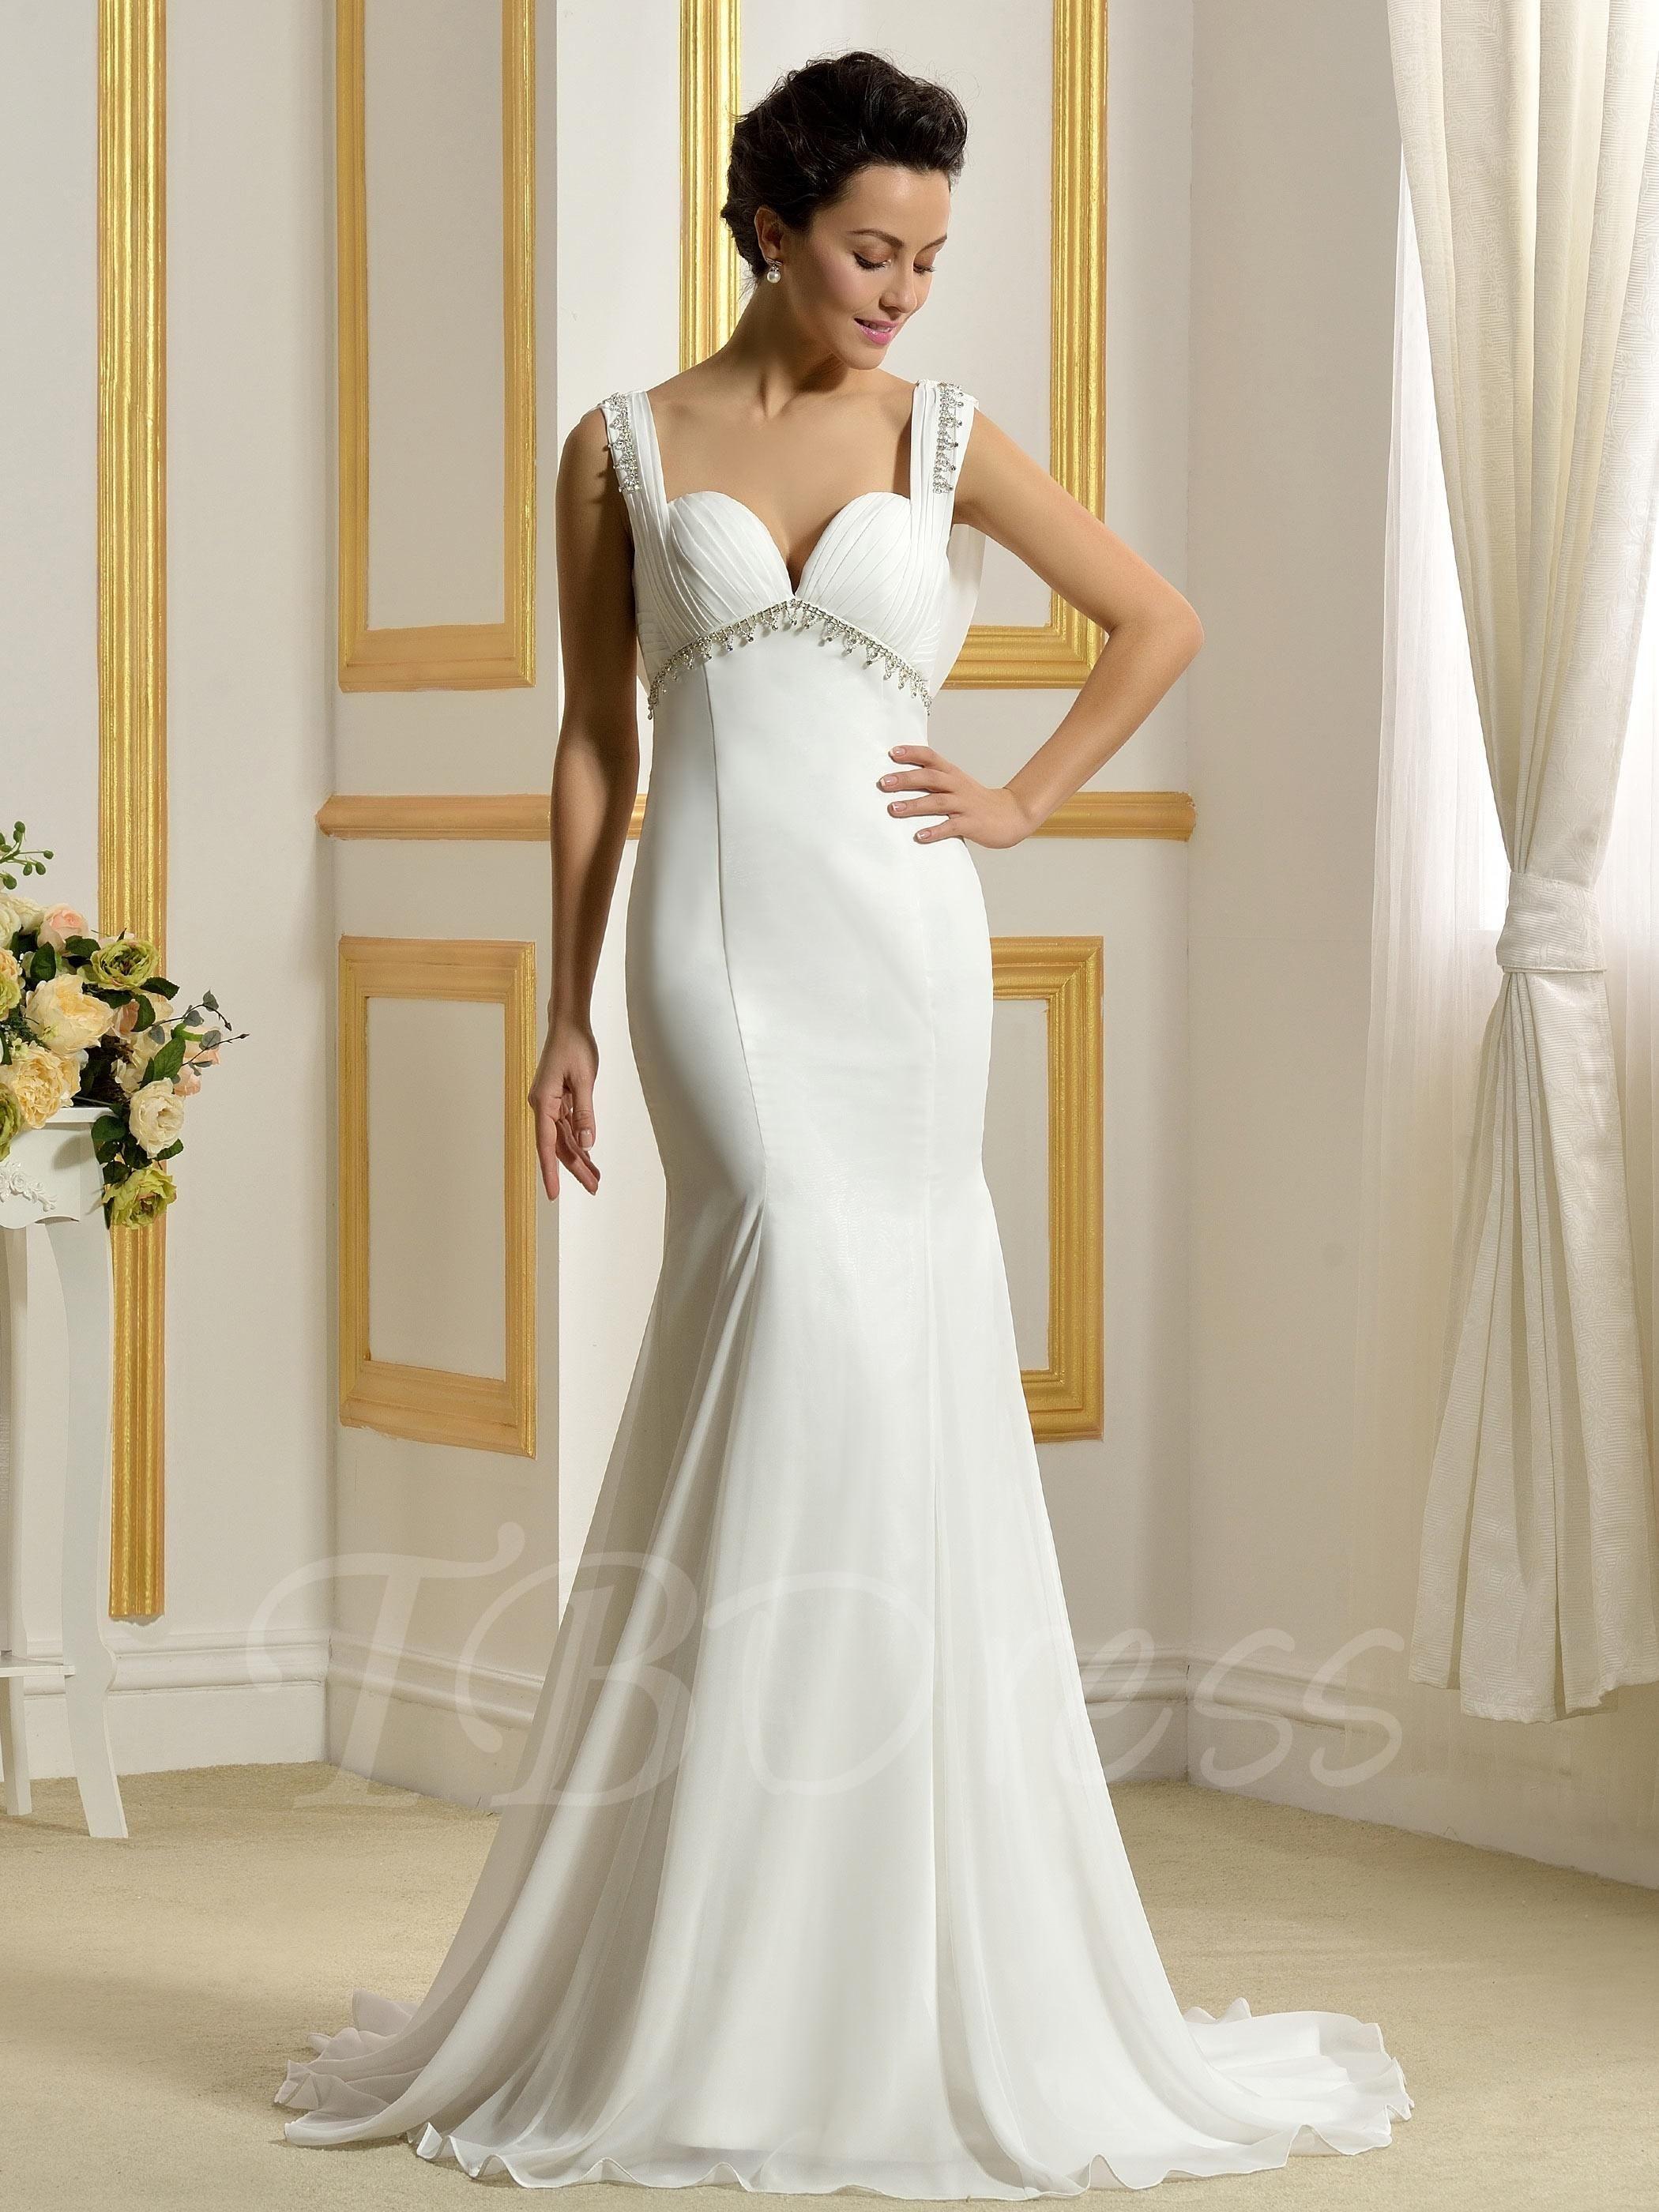 Lace dress gown  TBDress  TBDress Beading Chiffon Sweetheart Straps TrumpetMermaid